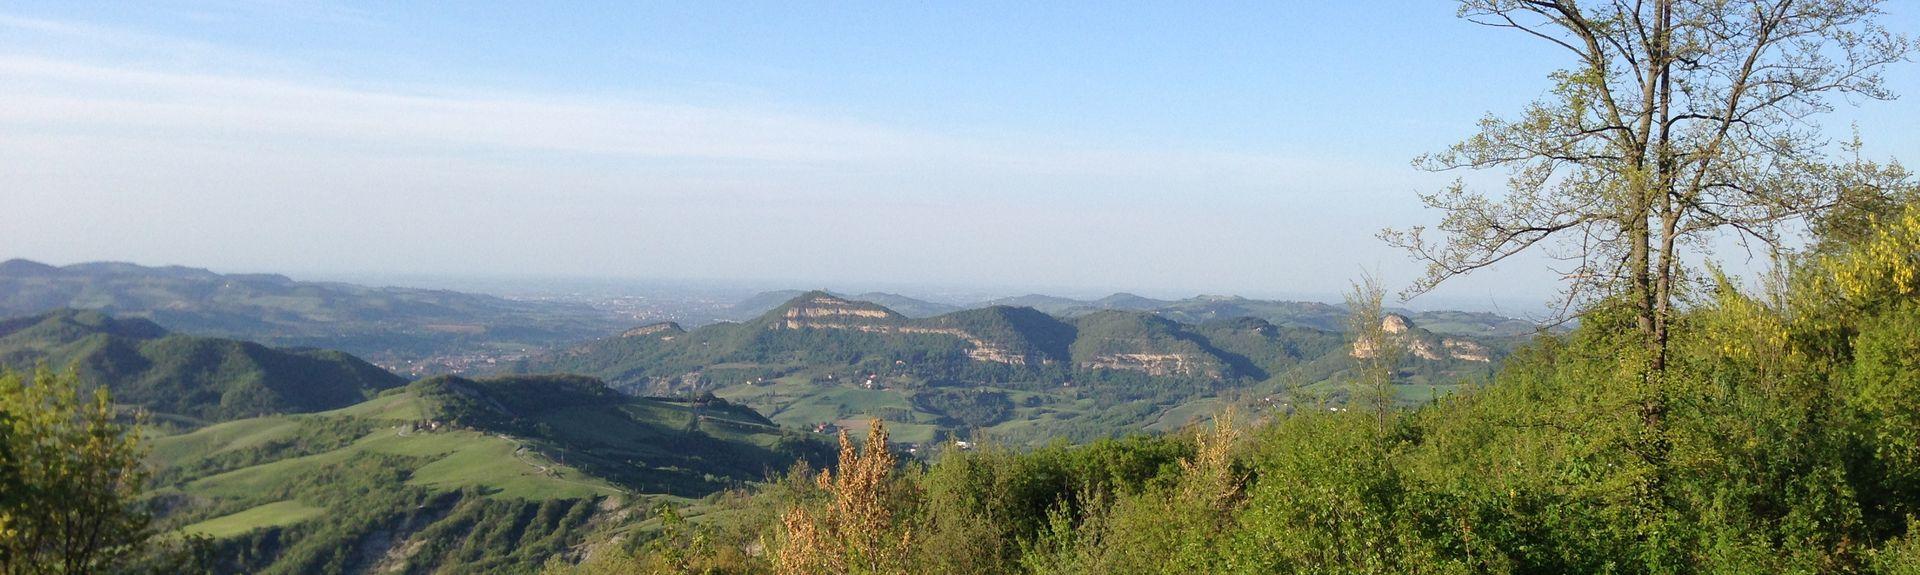 Marzabotto, Emilia Romagna, Italia